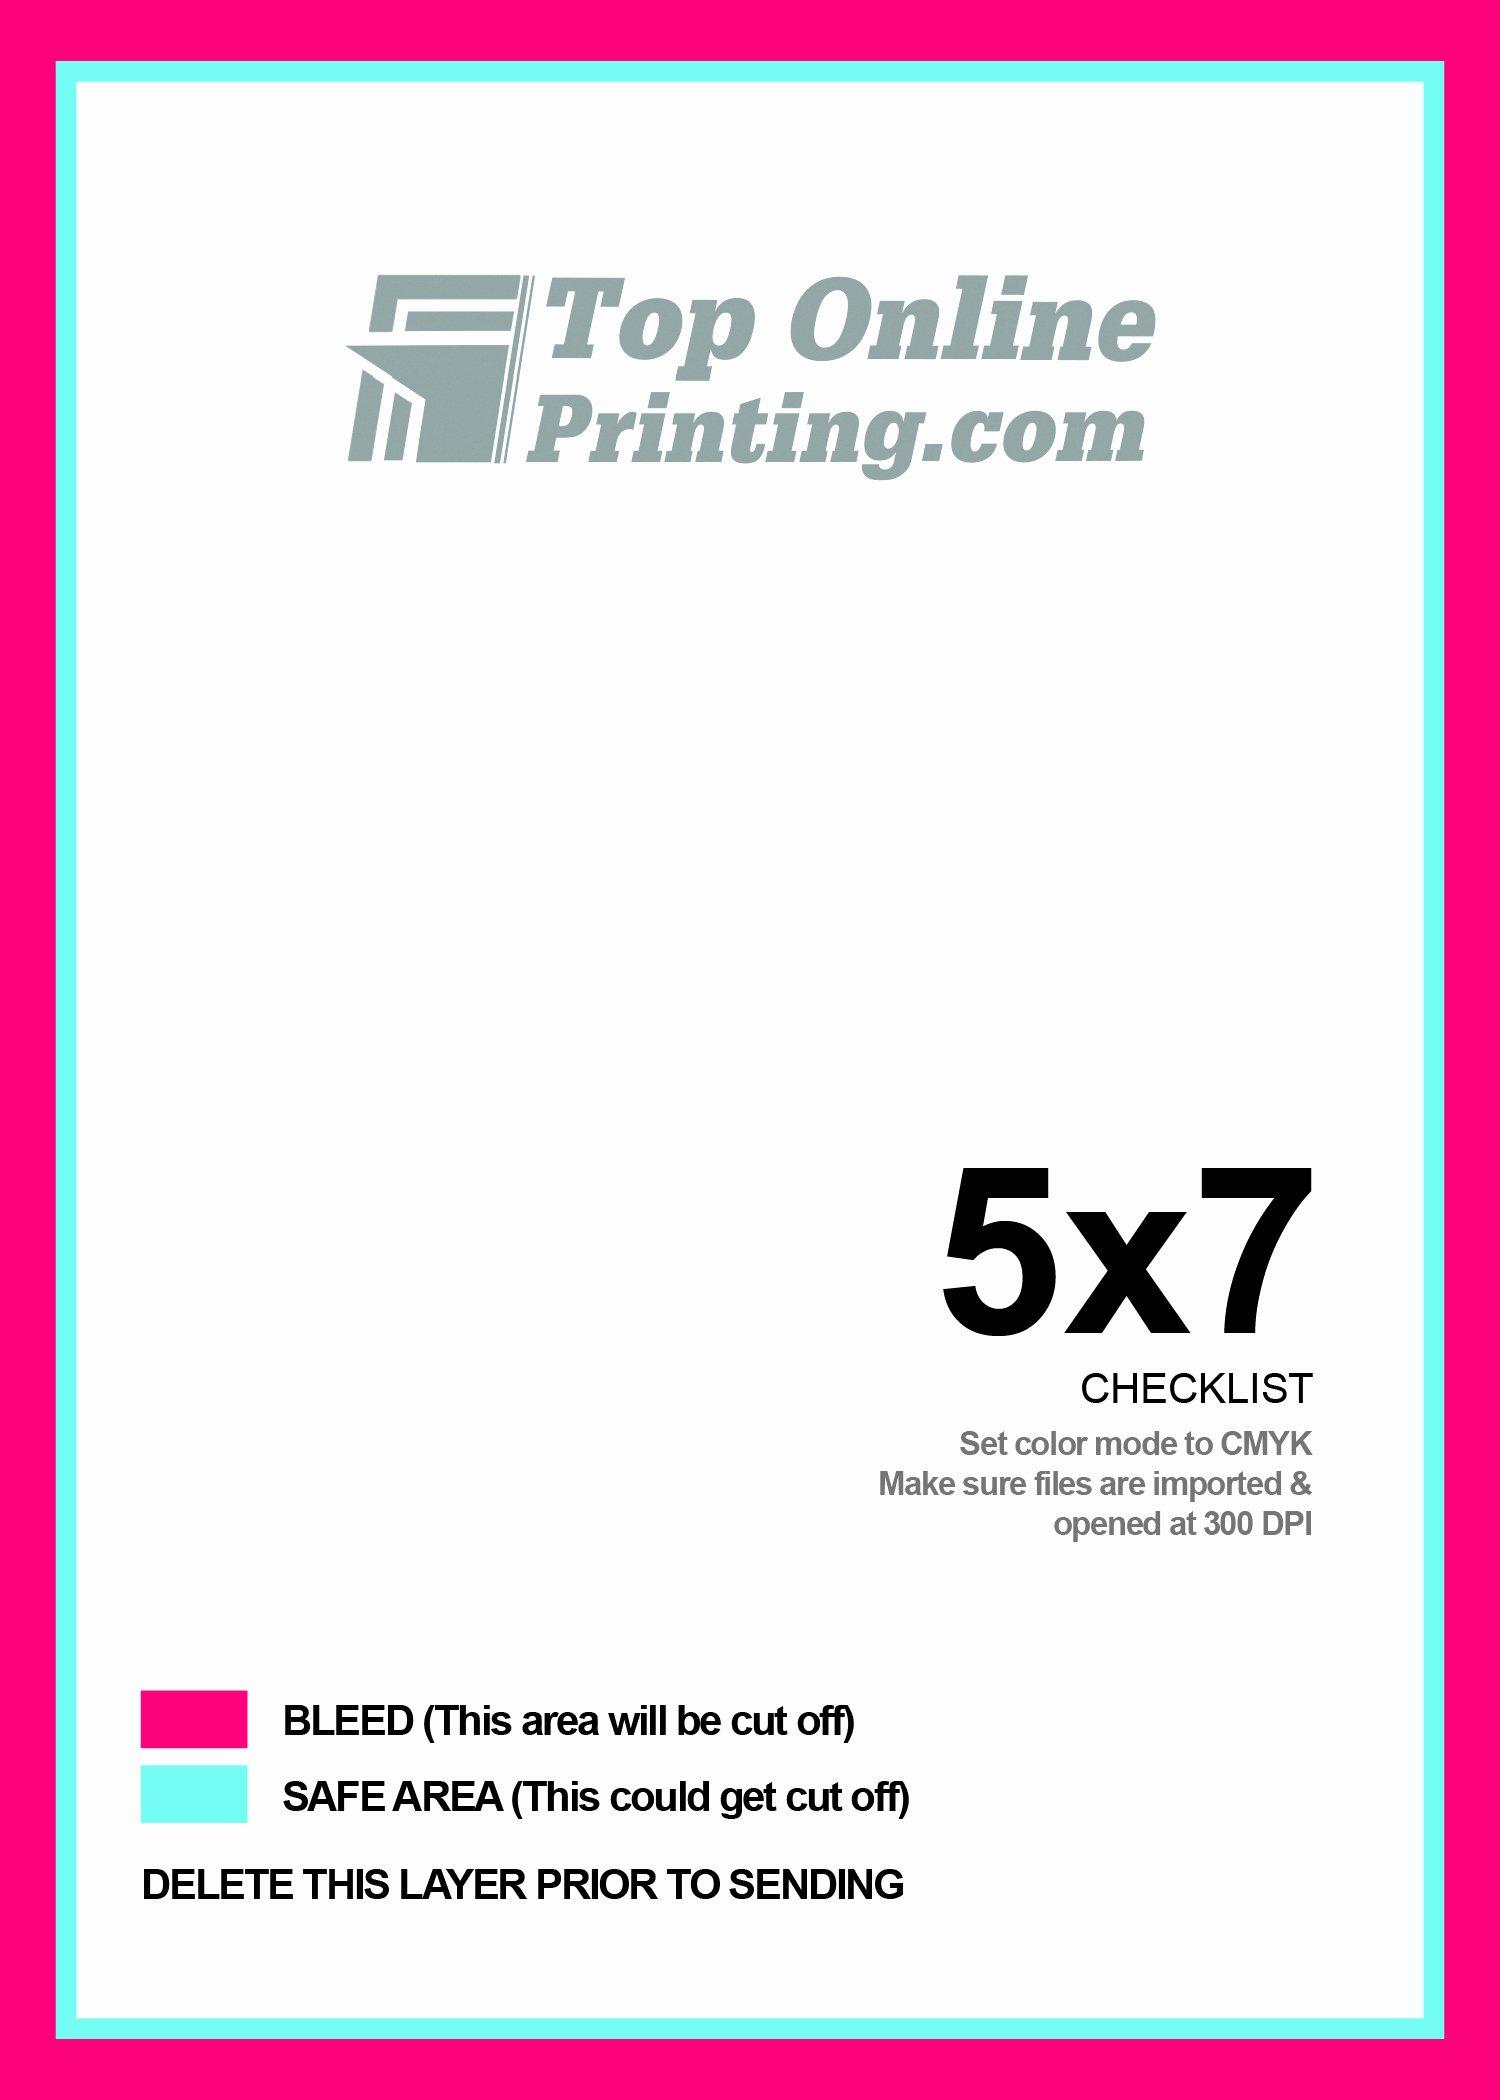 5 X 7 Postcard Template Lovely 5x7 Postcard Printing